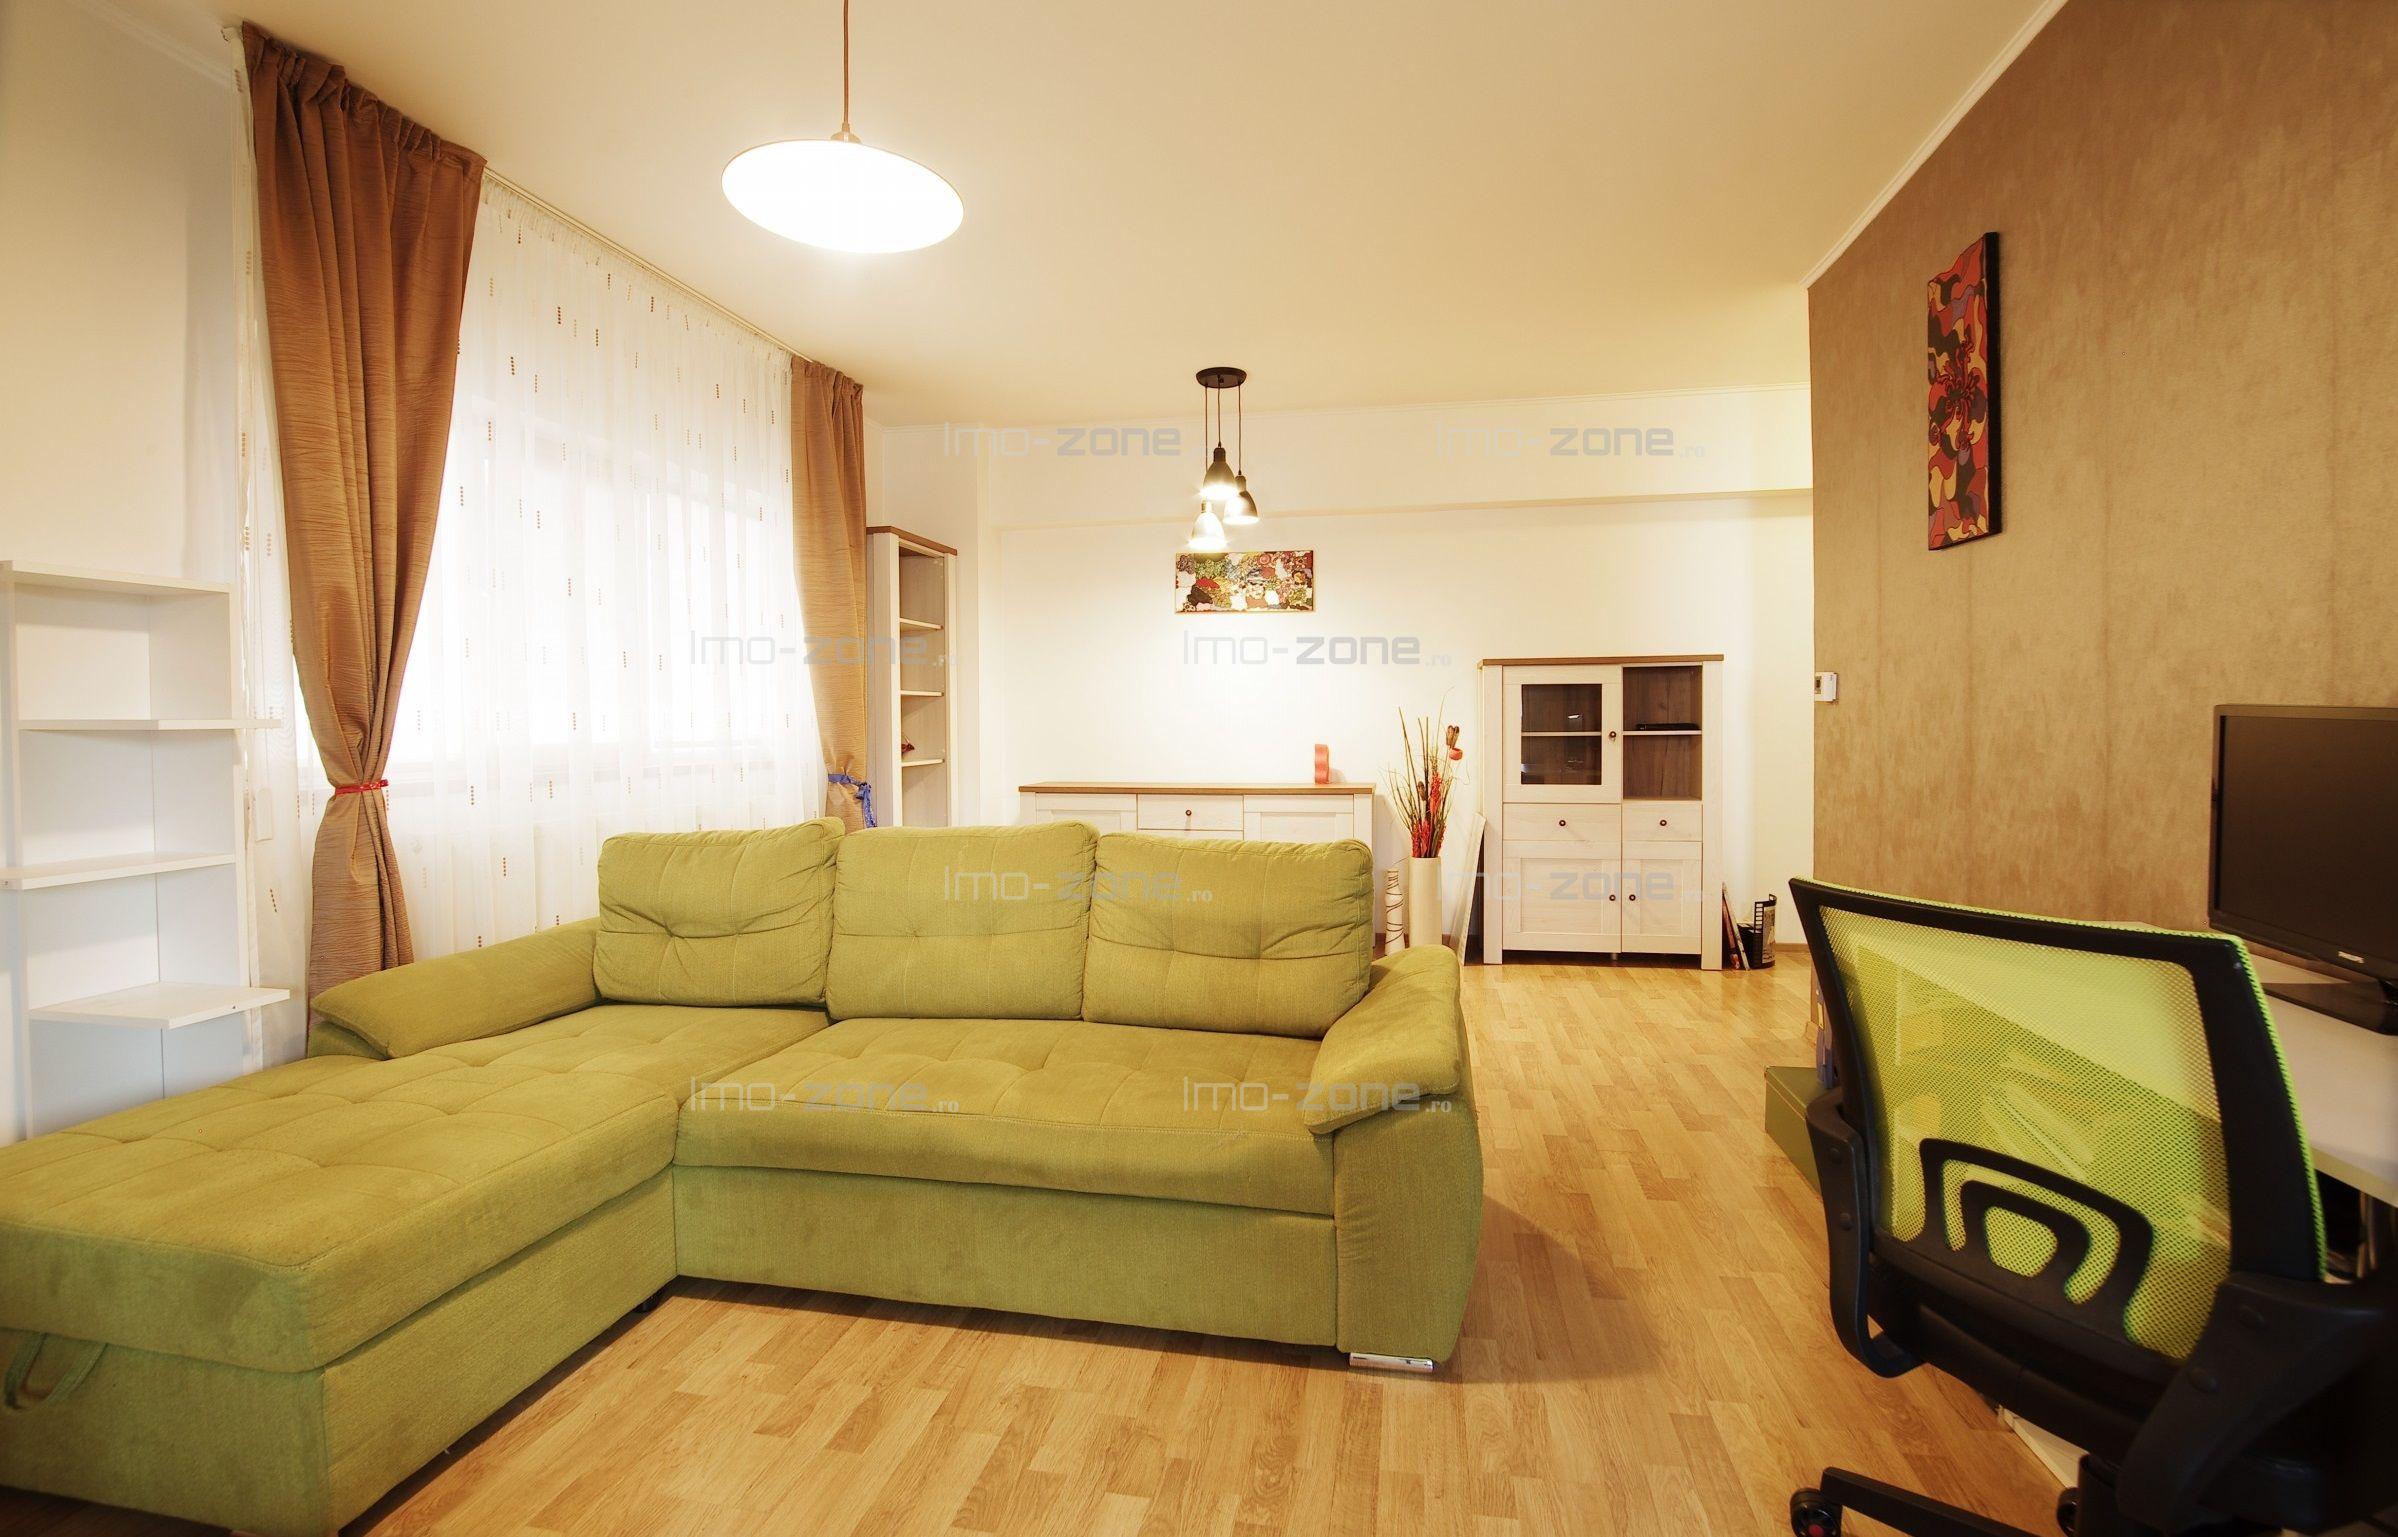 Apartament 3 camere 93 mp, Prelungirea Ghencea - Ansamblul Primavara